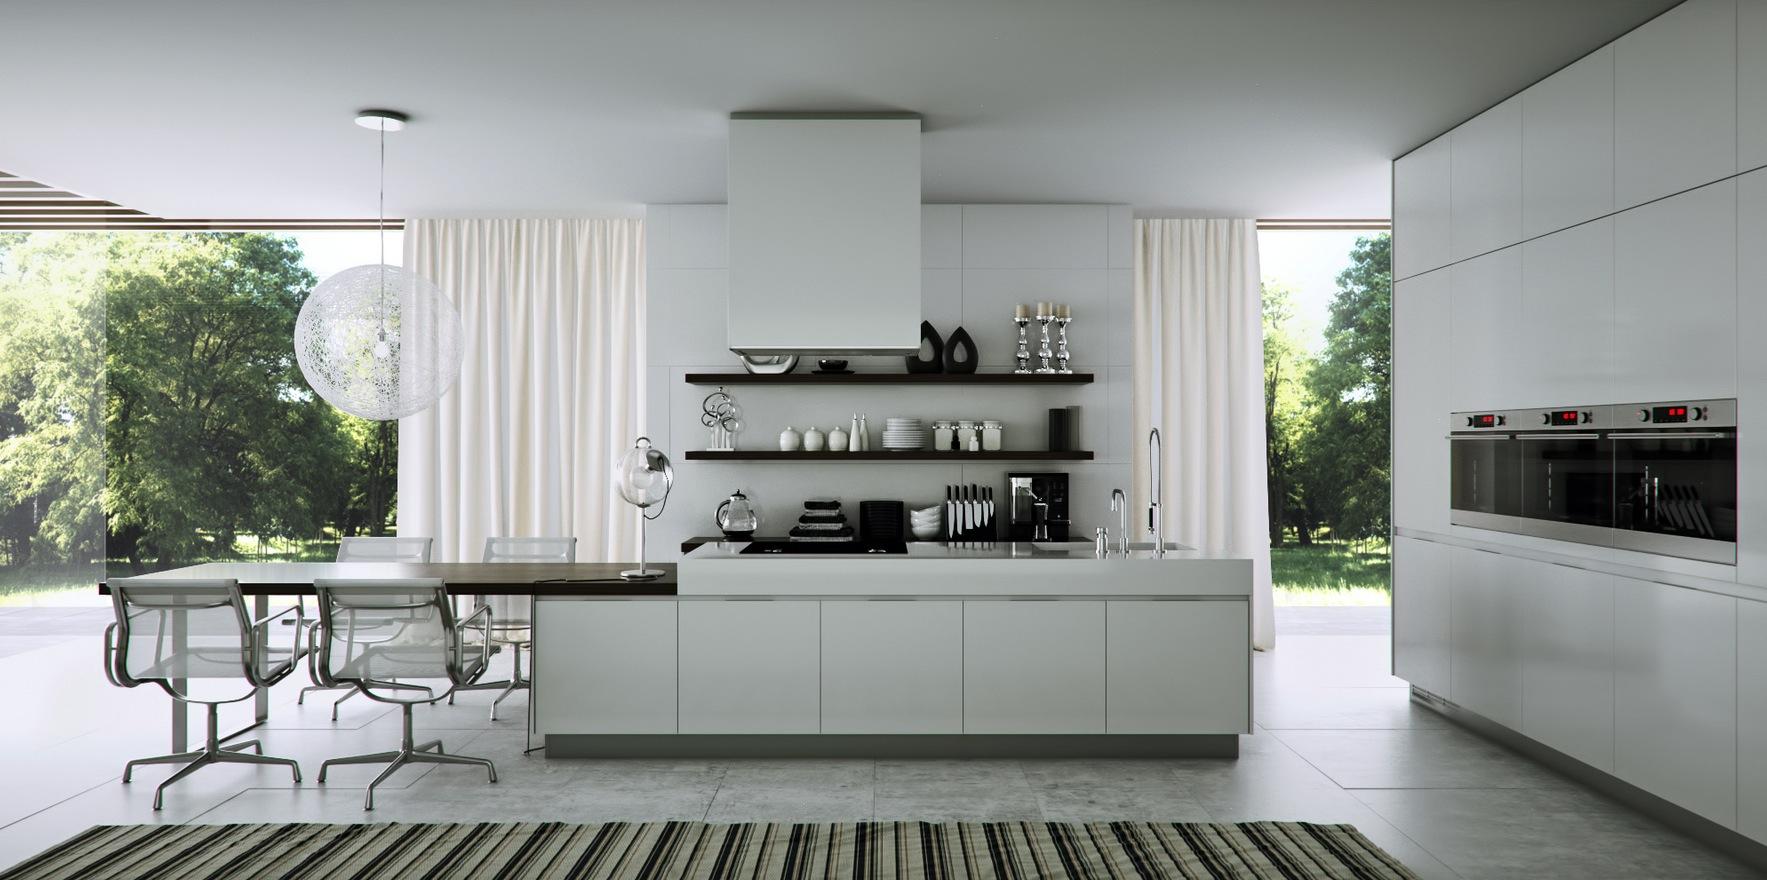 20 sharp masculine kitchens perfect for men